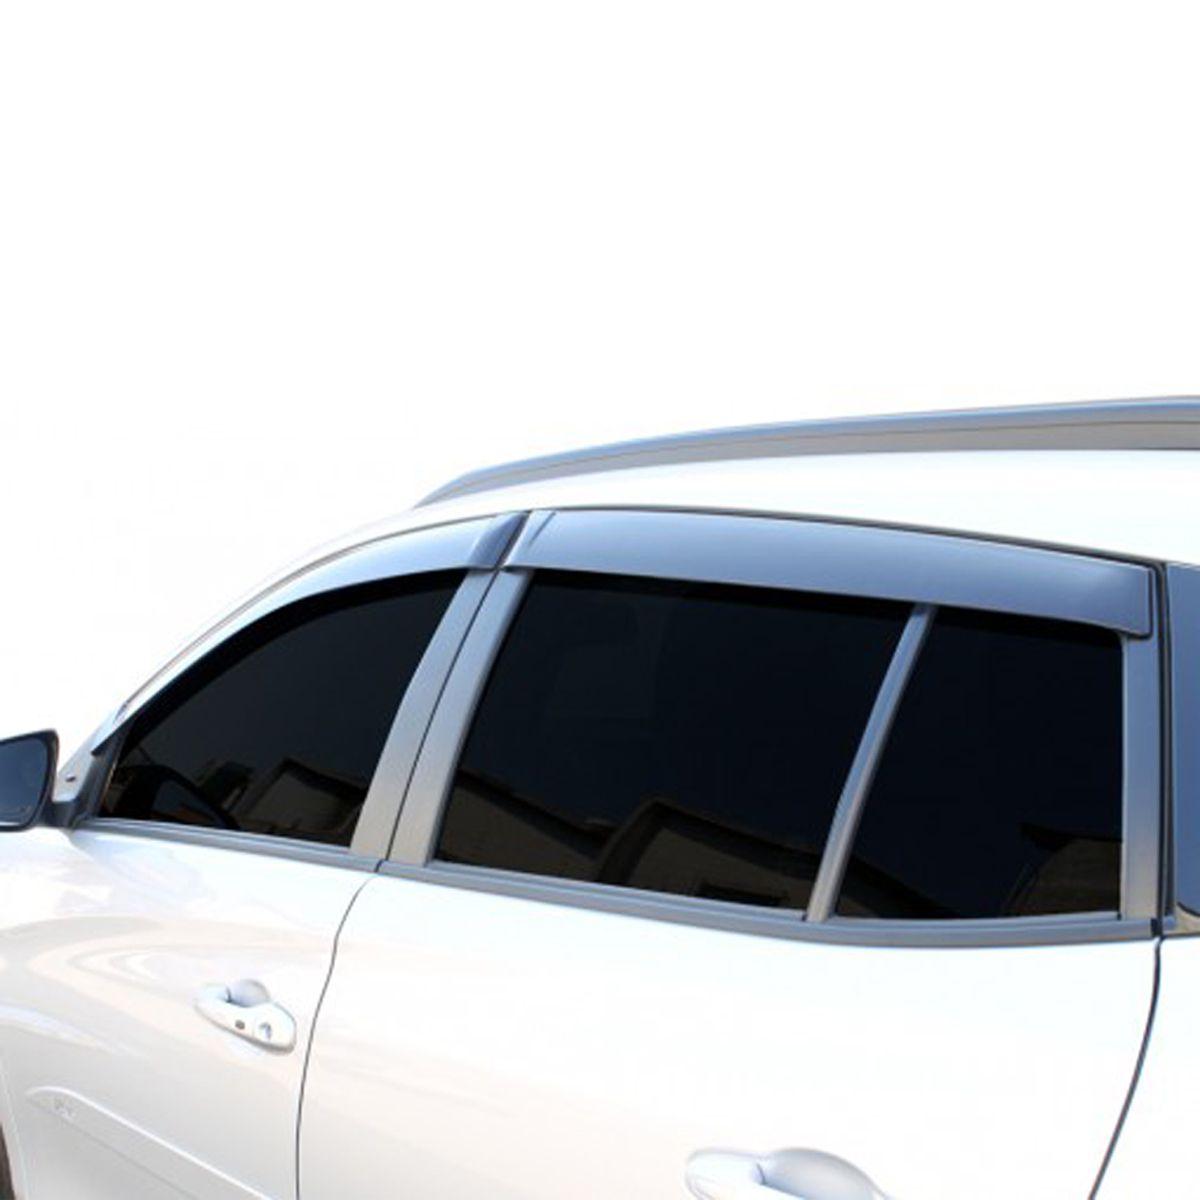 Calha de Chuva Yaris Hatch Defletor TG Poli